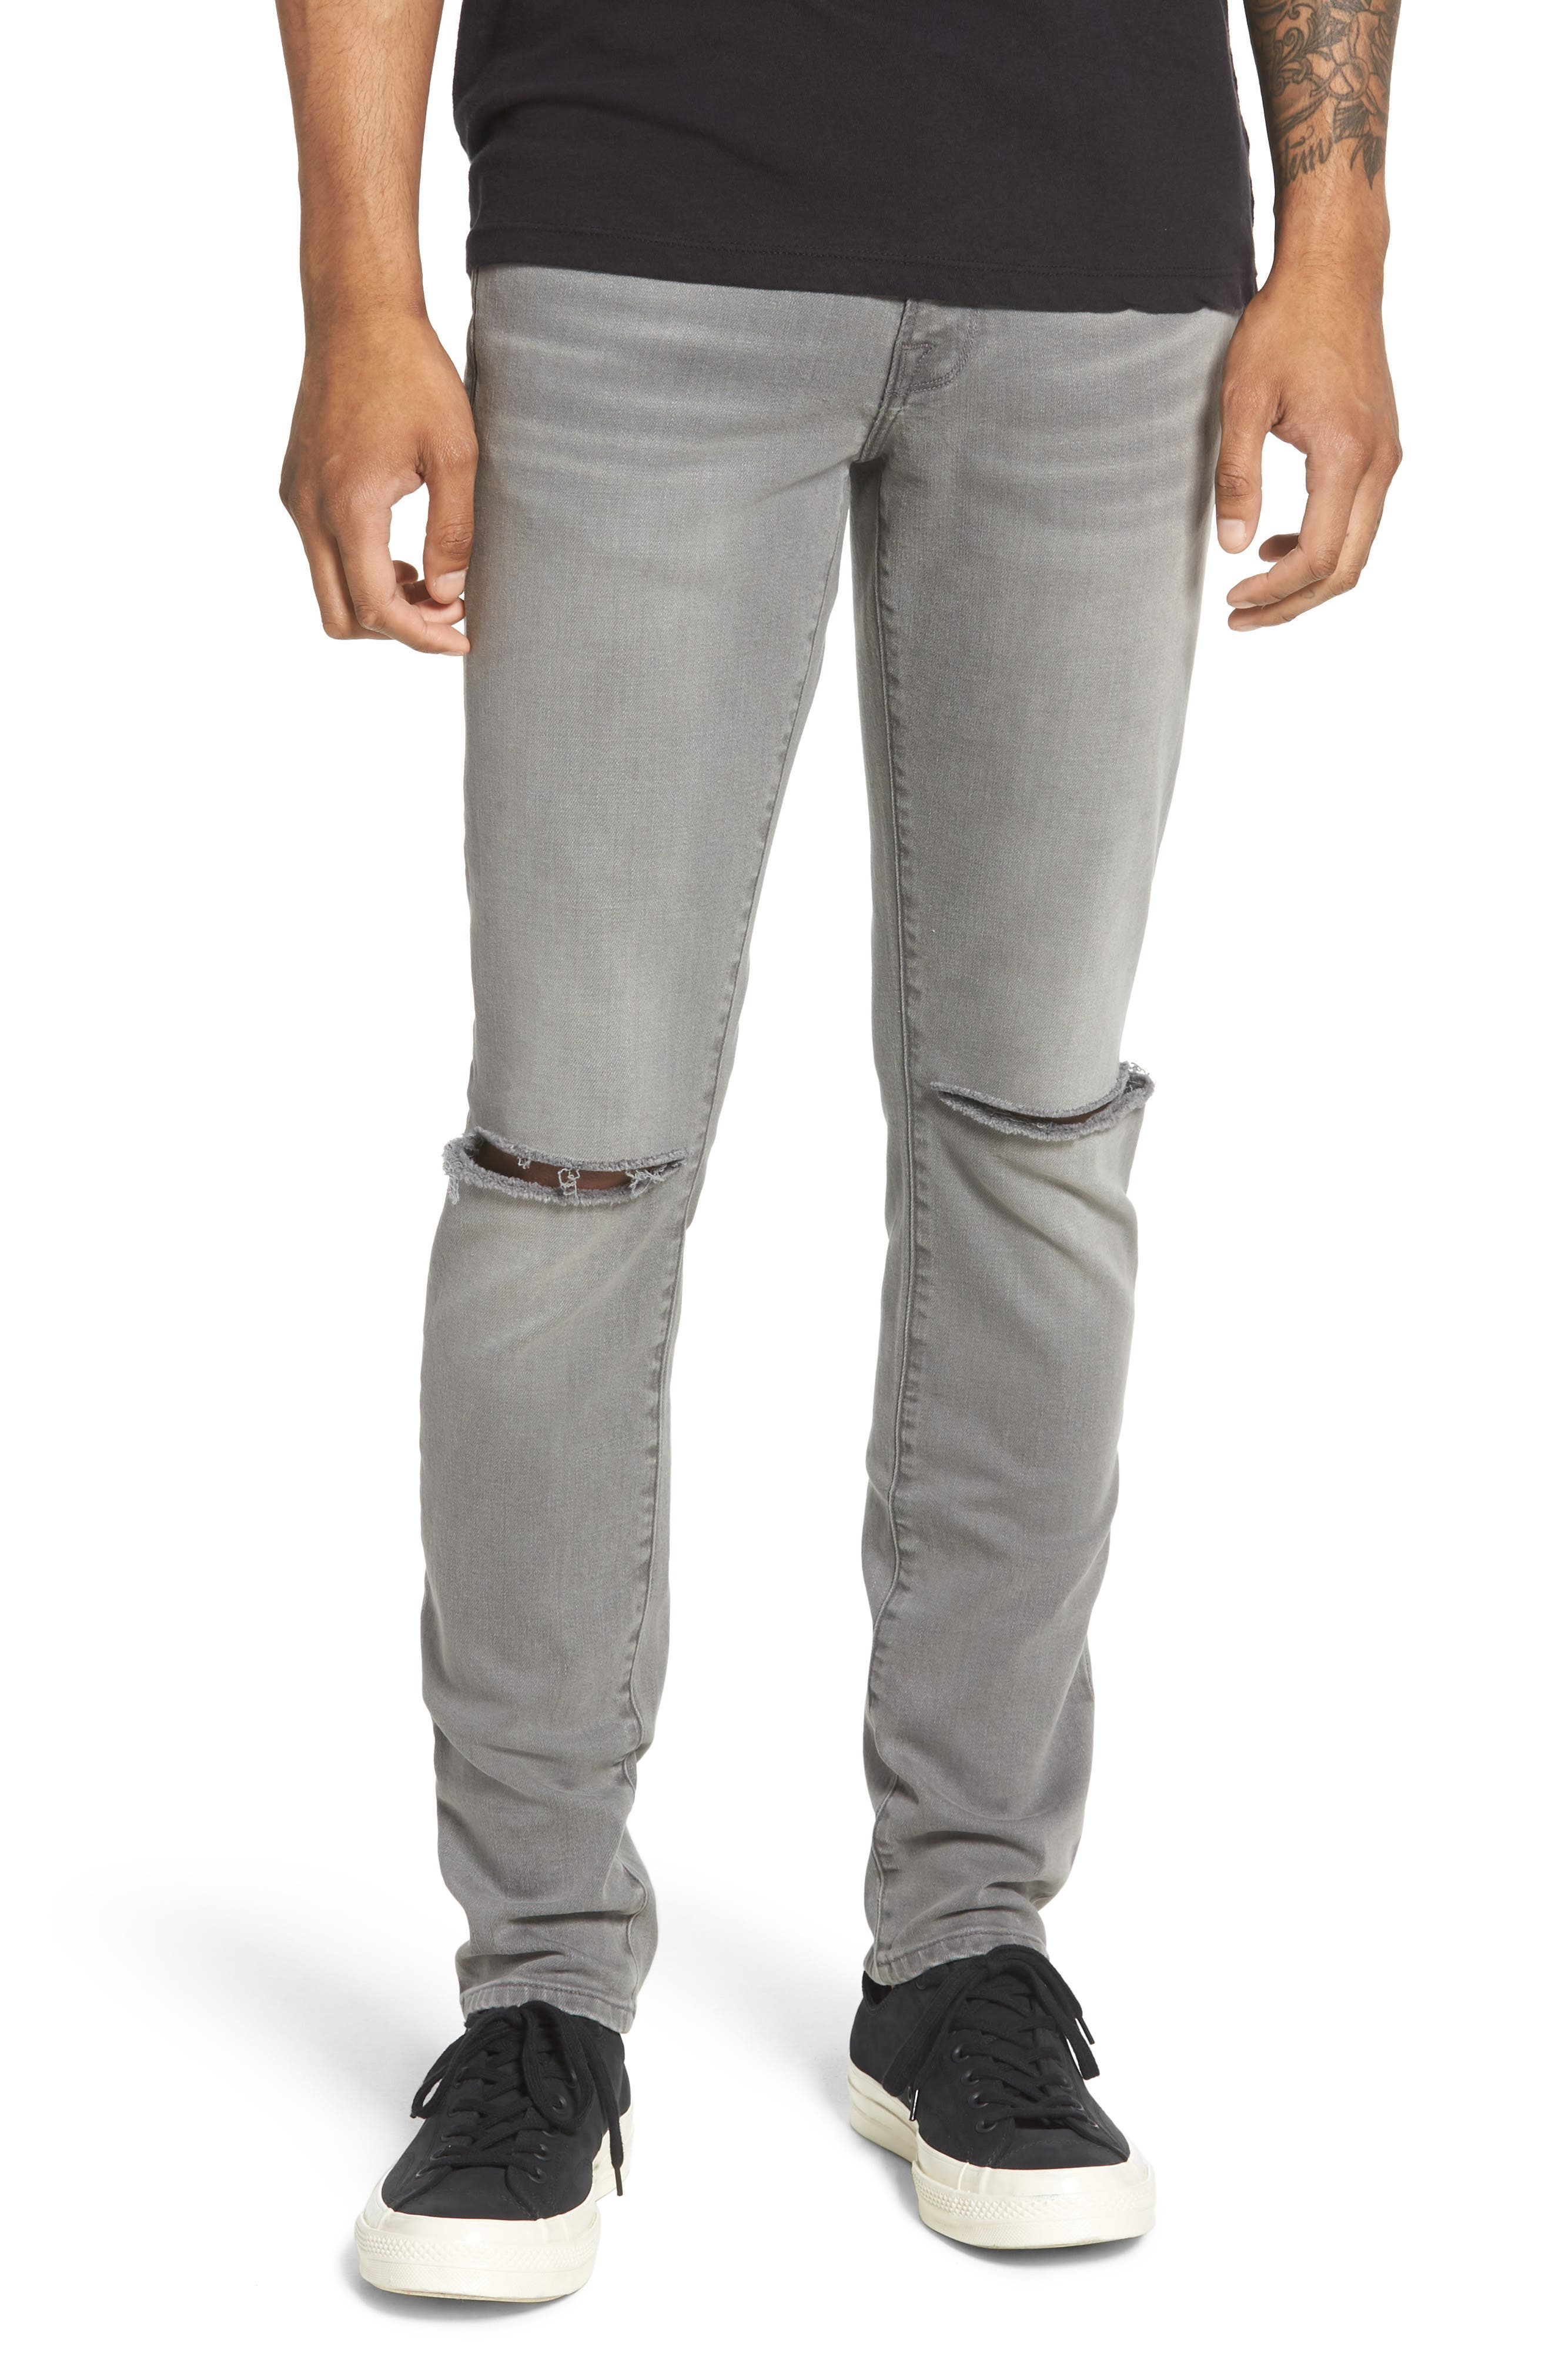 L'Homme Skinny Fit Jeans,                         Main,                         color, 030